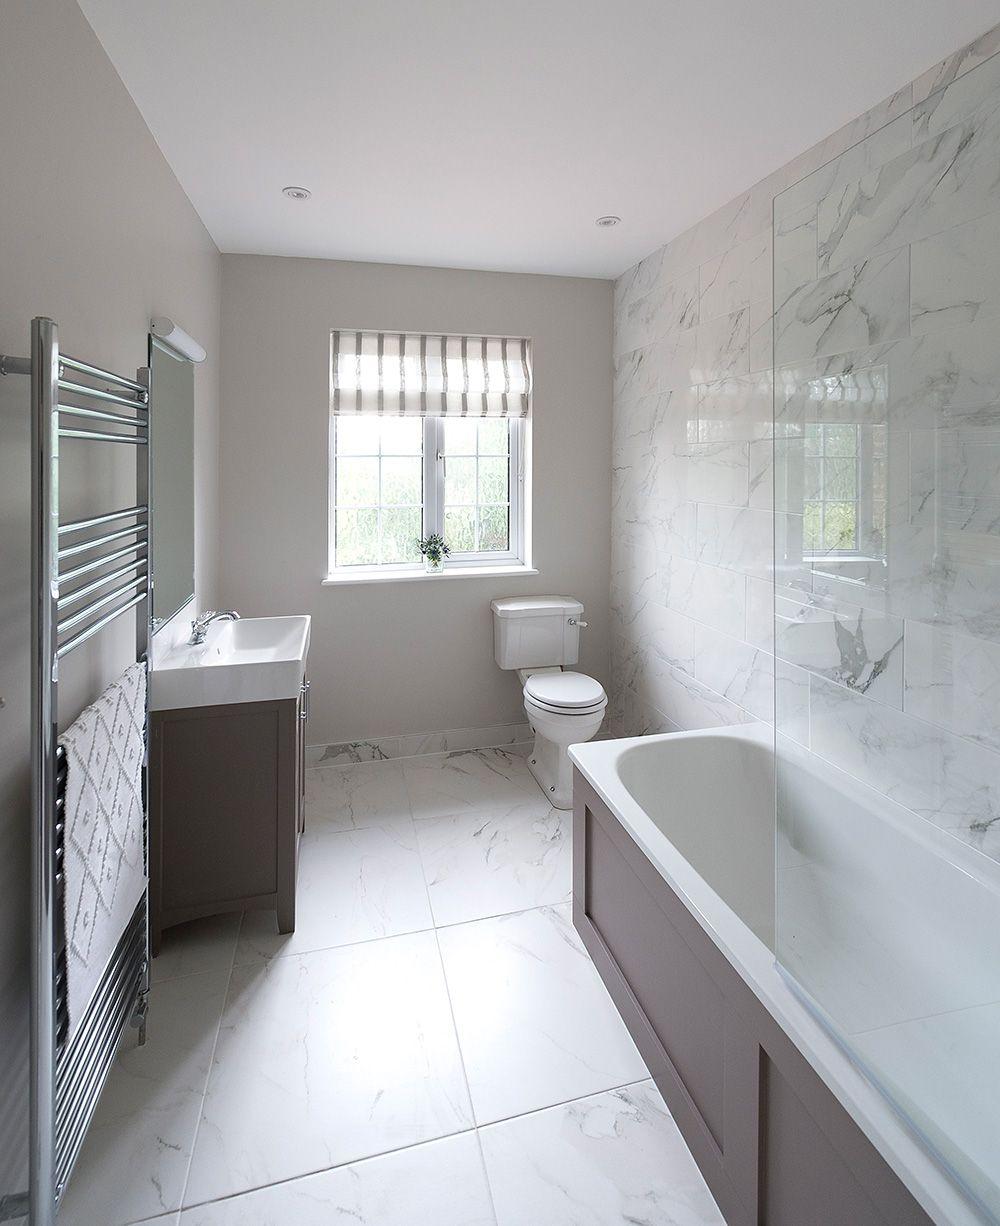 Bathroom Interior Designers London in 2020   Bathroom ...